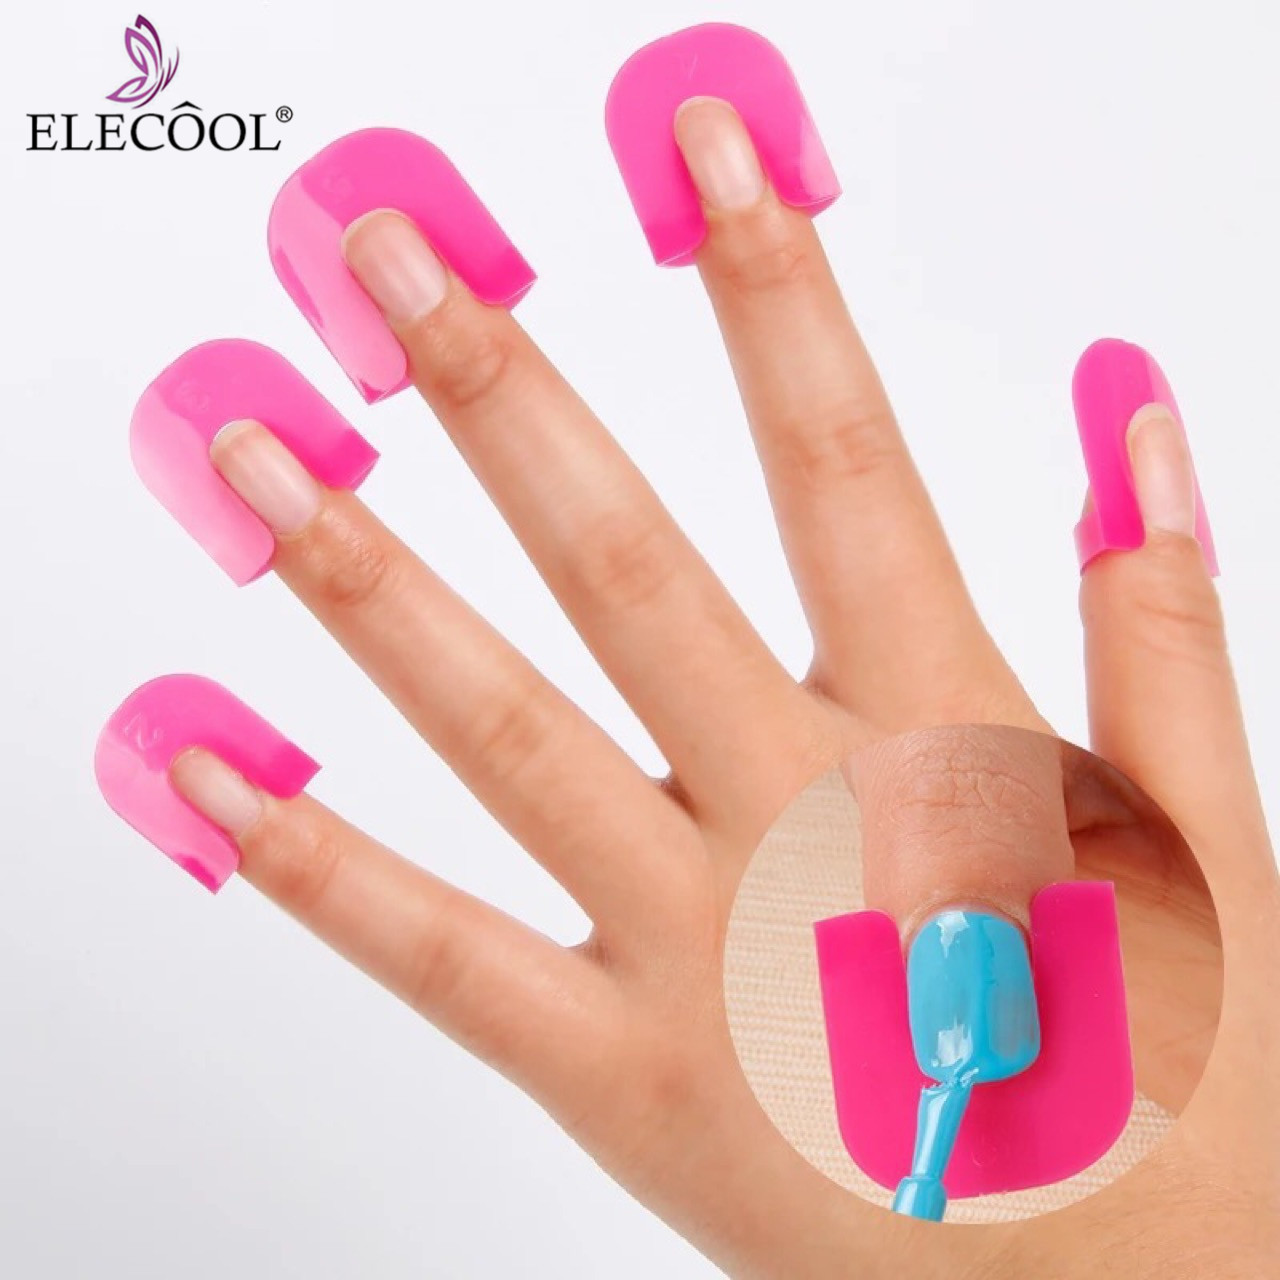 ELECOOL 26Pcs Pink Nail Gel Accessories Model Clip Nail Edge Polish Glue Overflow Preven Tool Portable DIY Nail Art Manicure Set portable peg clip set